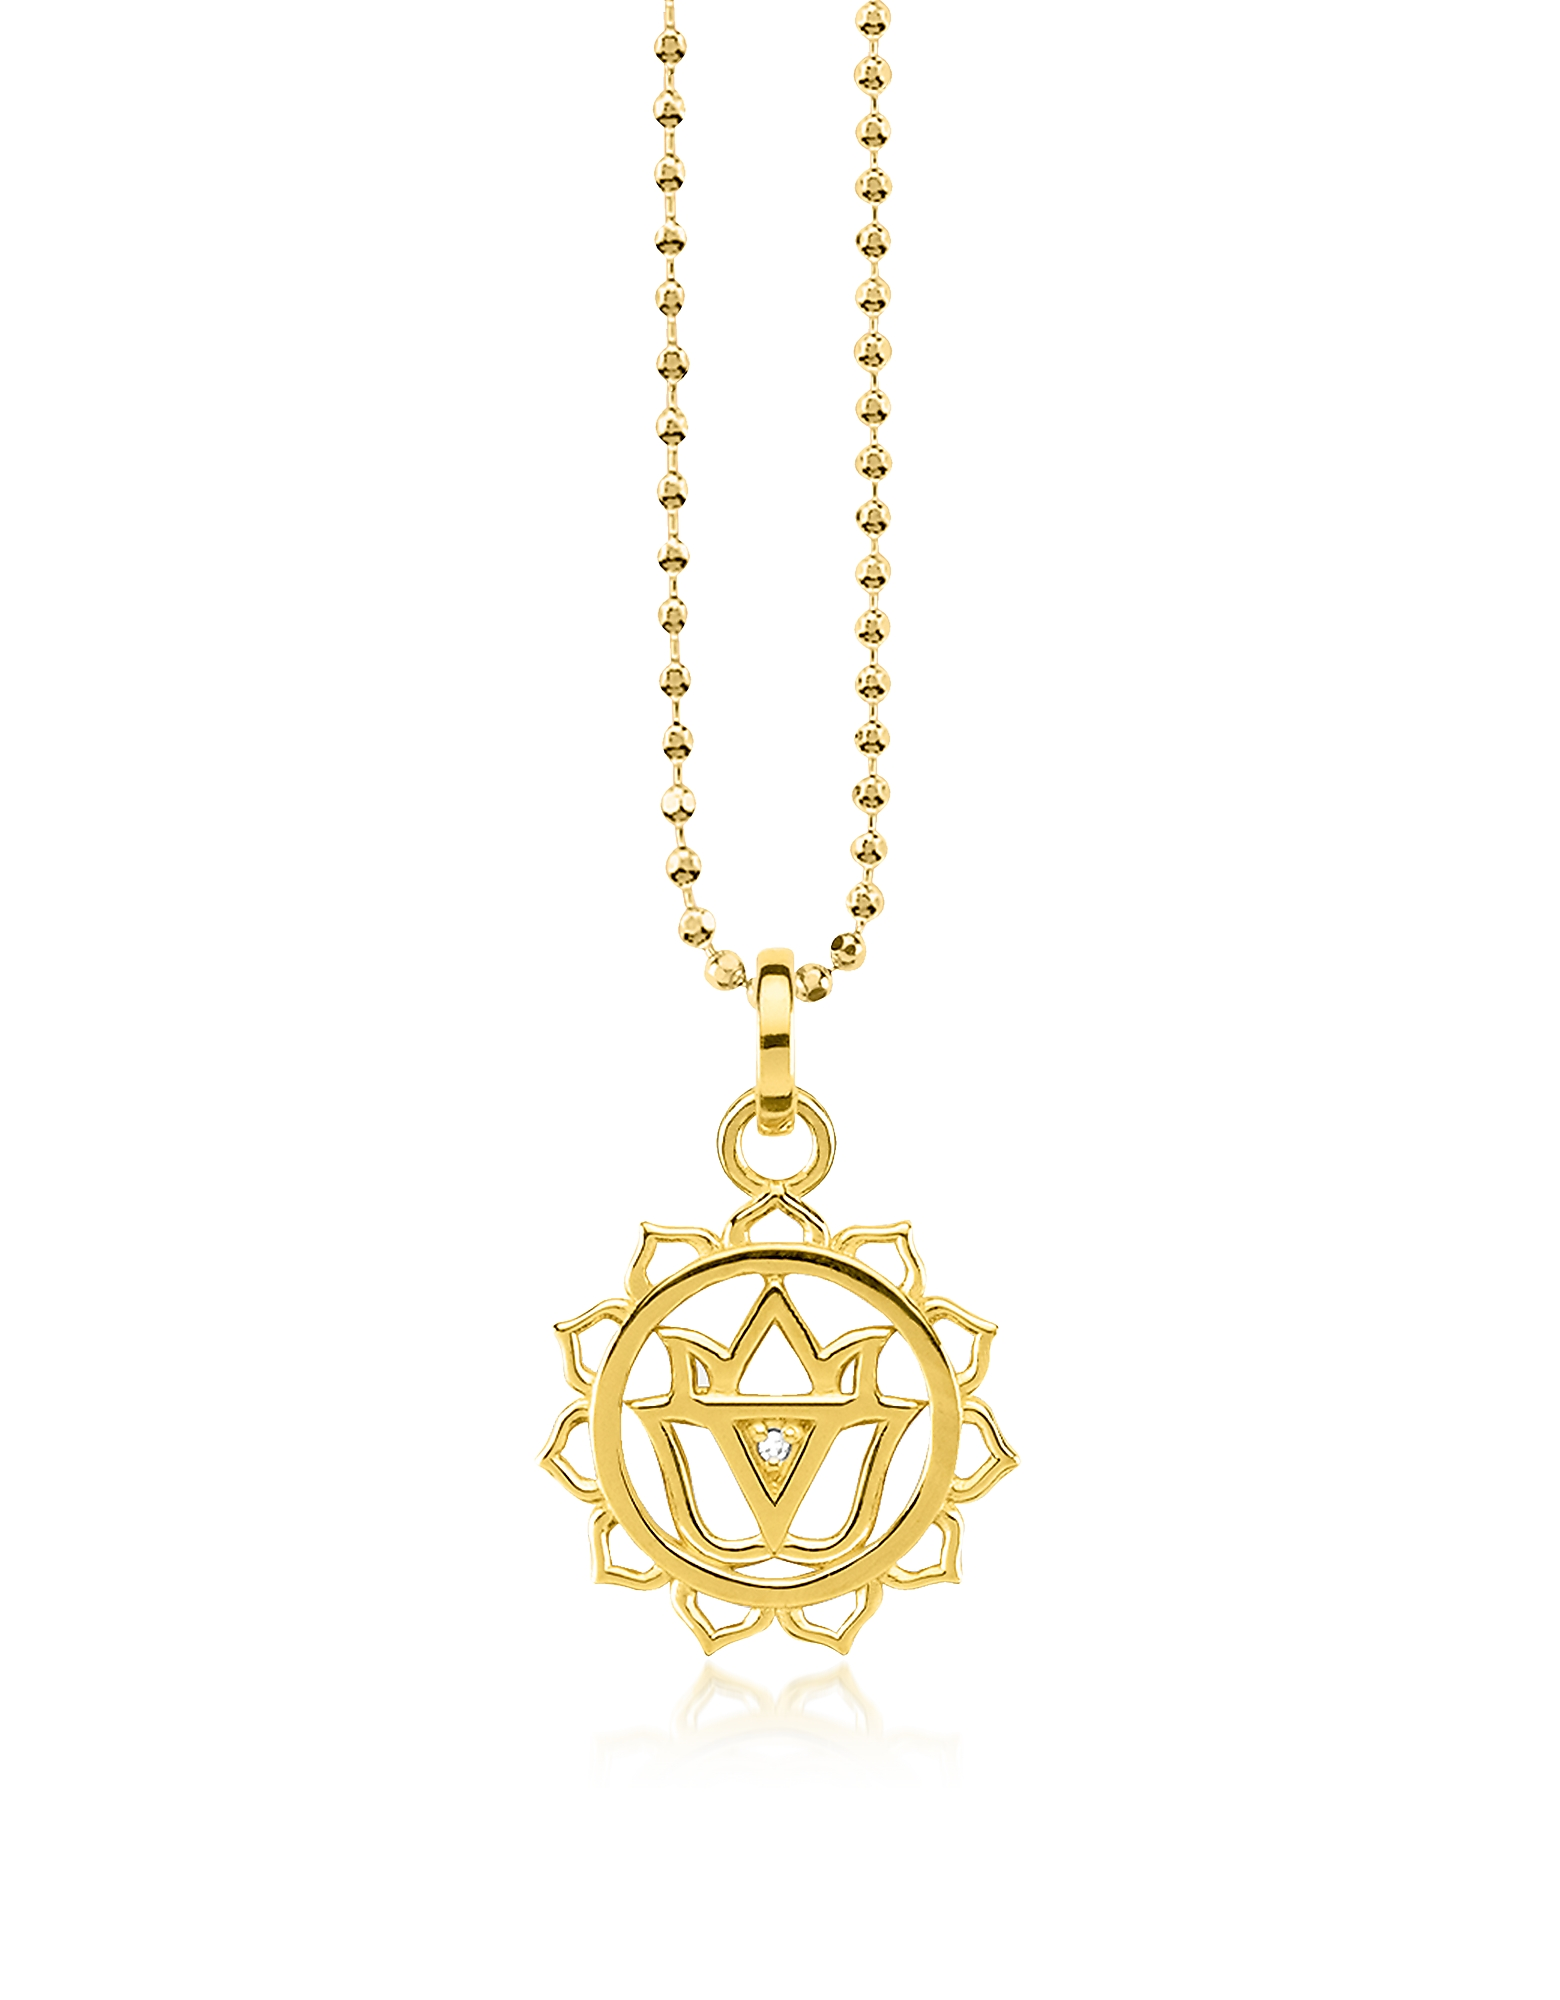 Thomas Sabo Necklaces, Solar Plexus Chakra Yellow Gold Plated Sterling Silver Necklace w/White Zirco